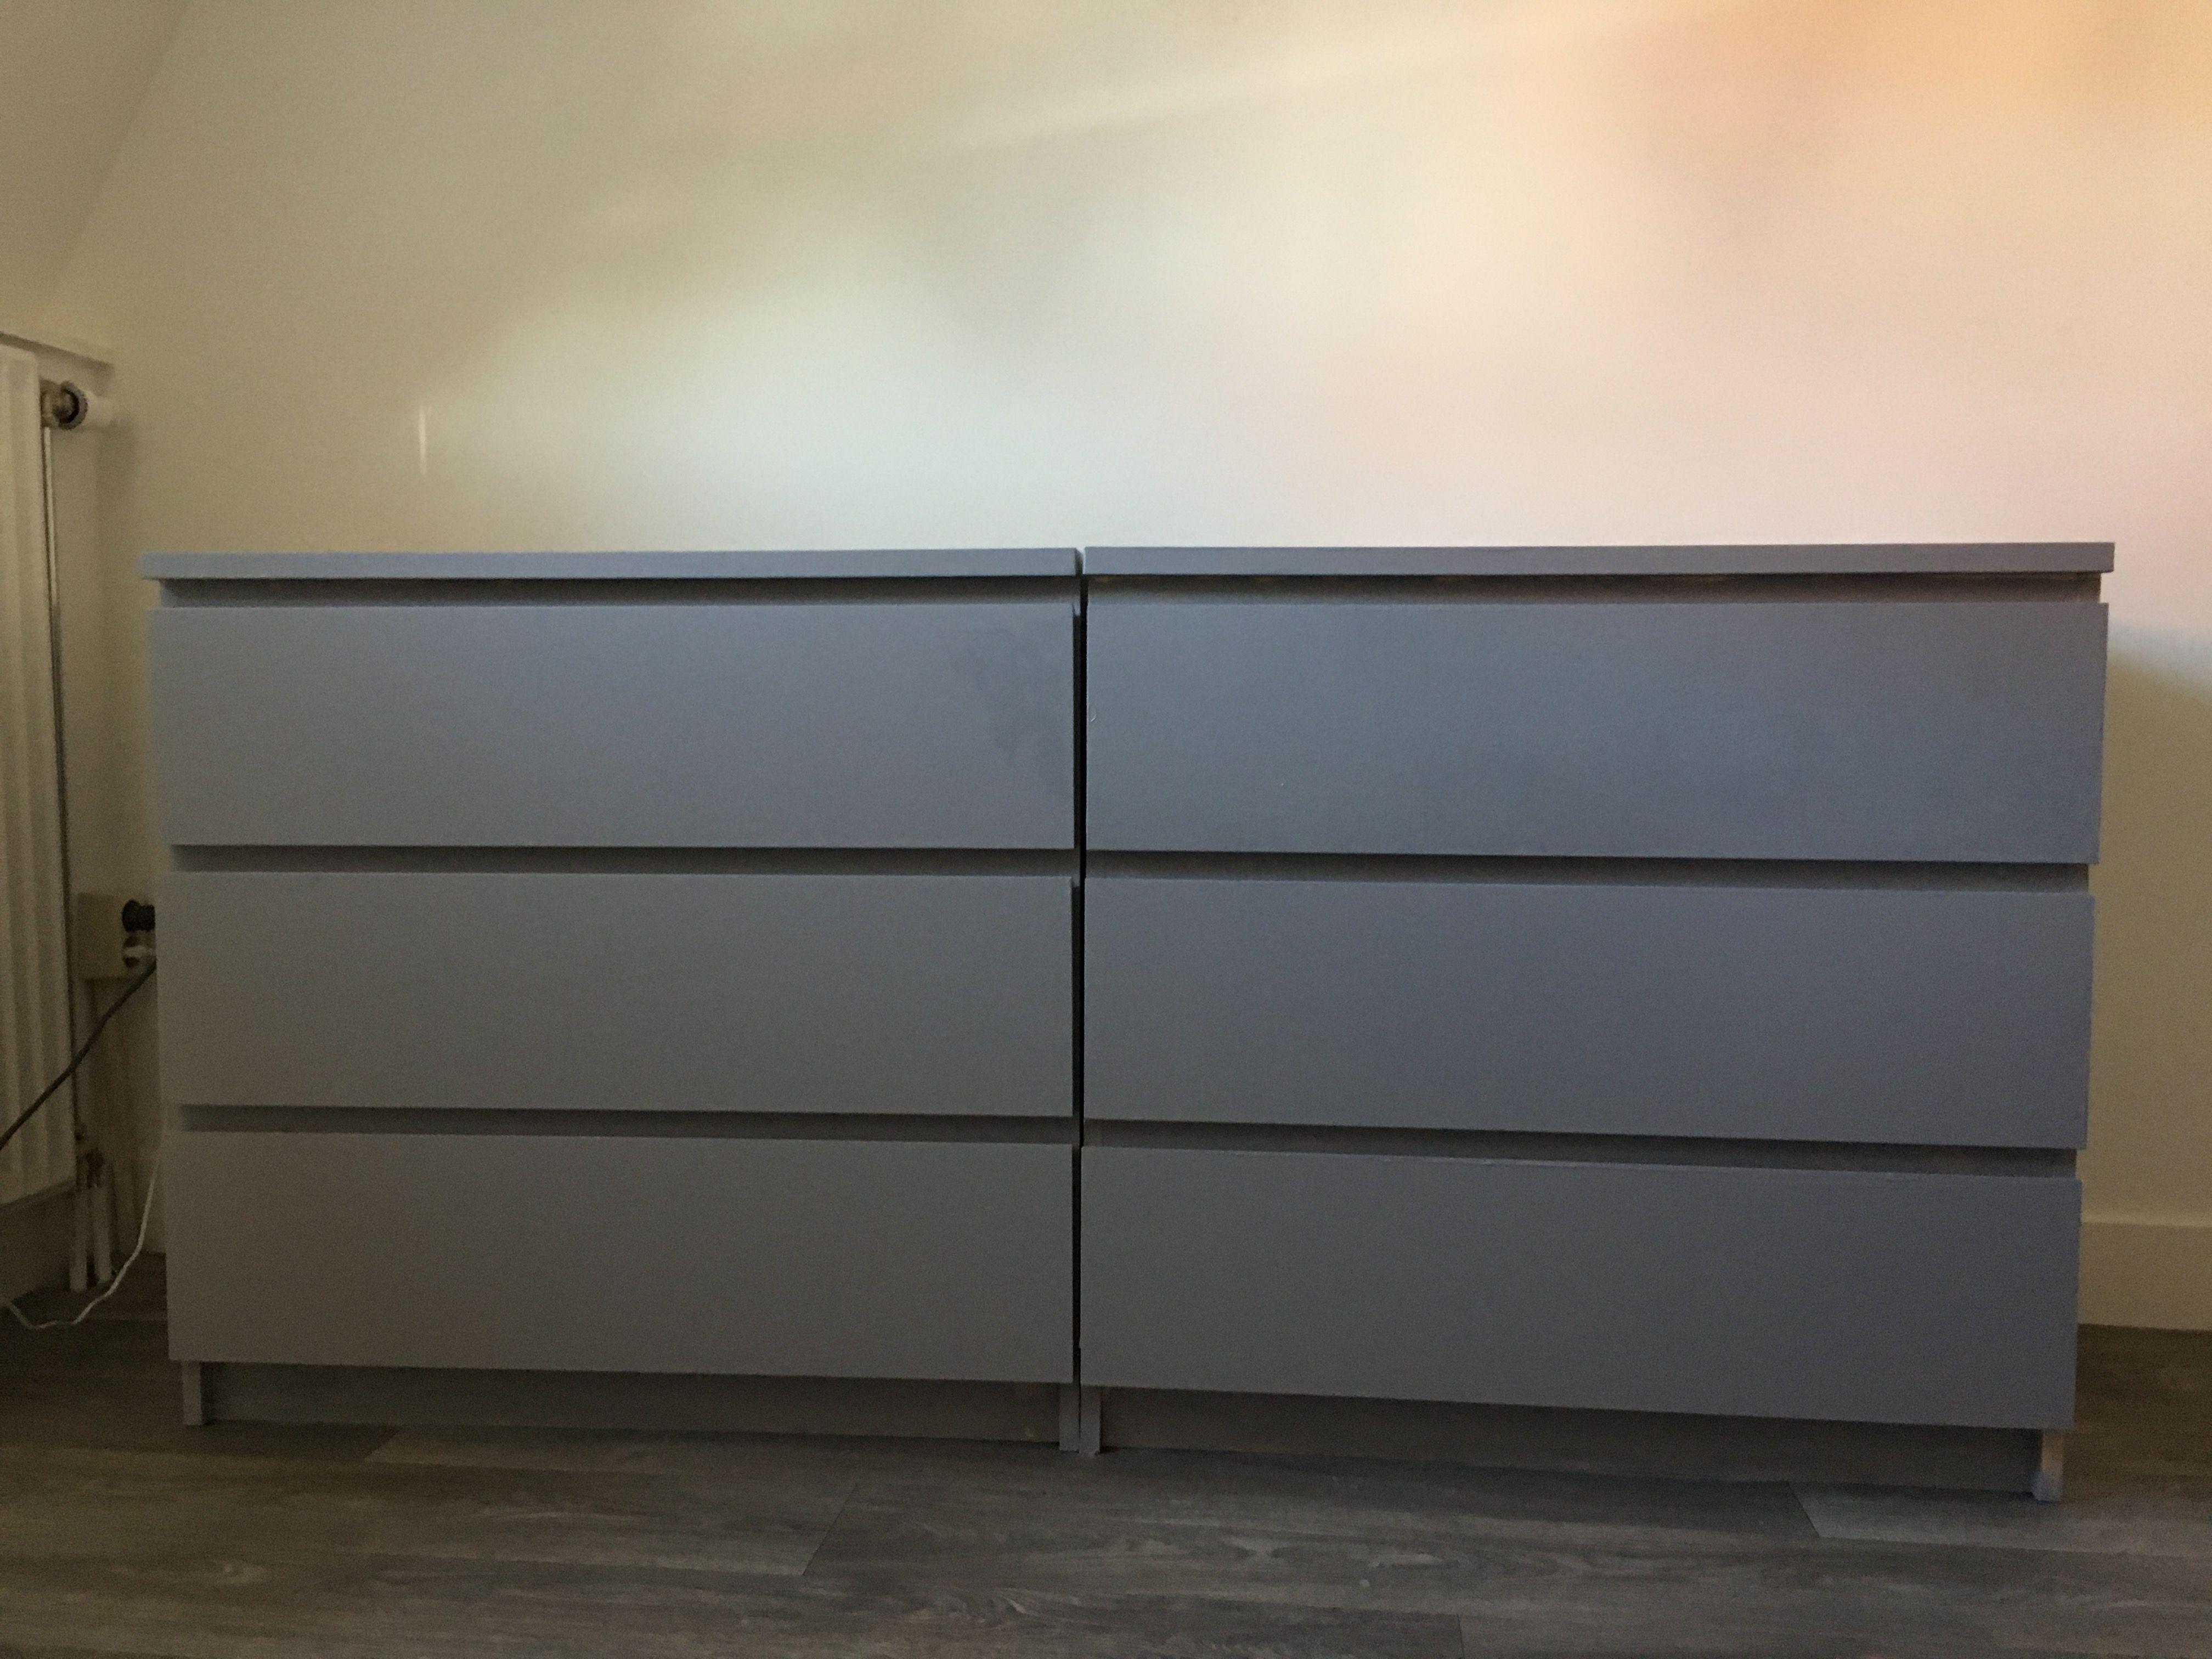 Ikea malm kast met ral acryl satijnlak van action